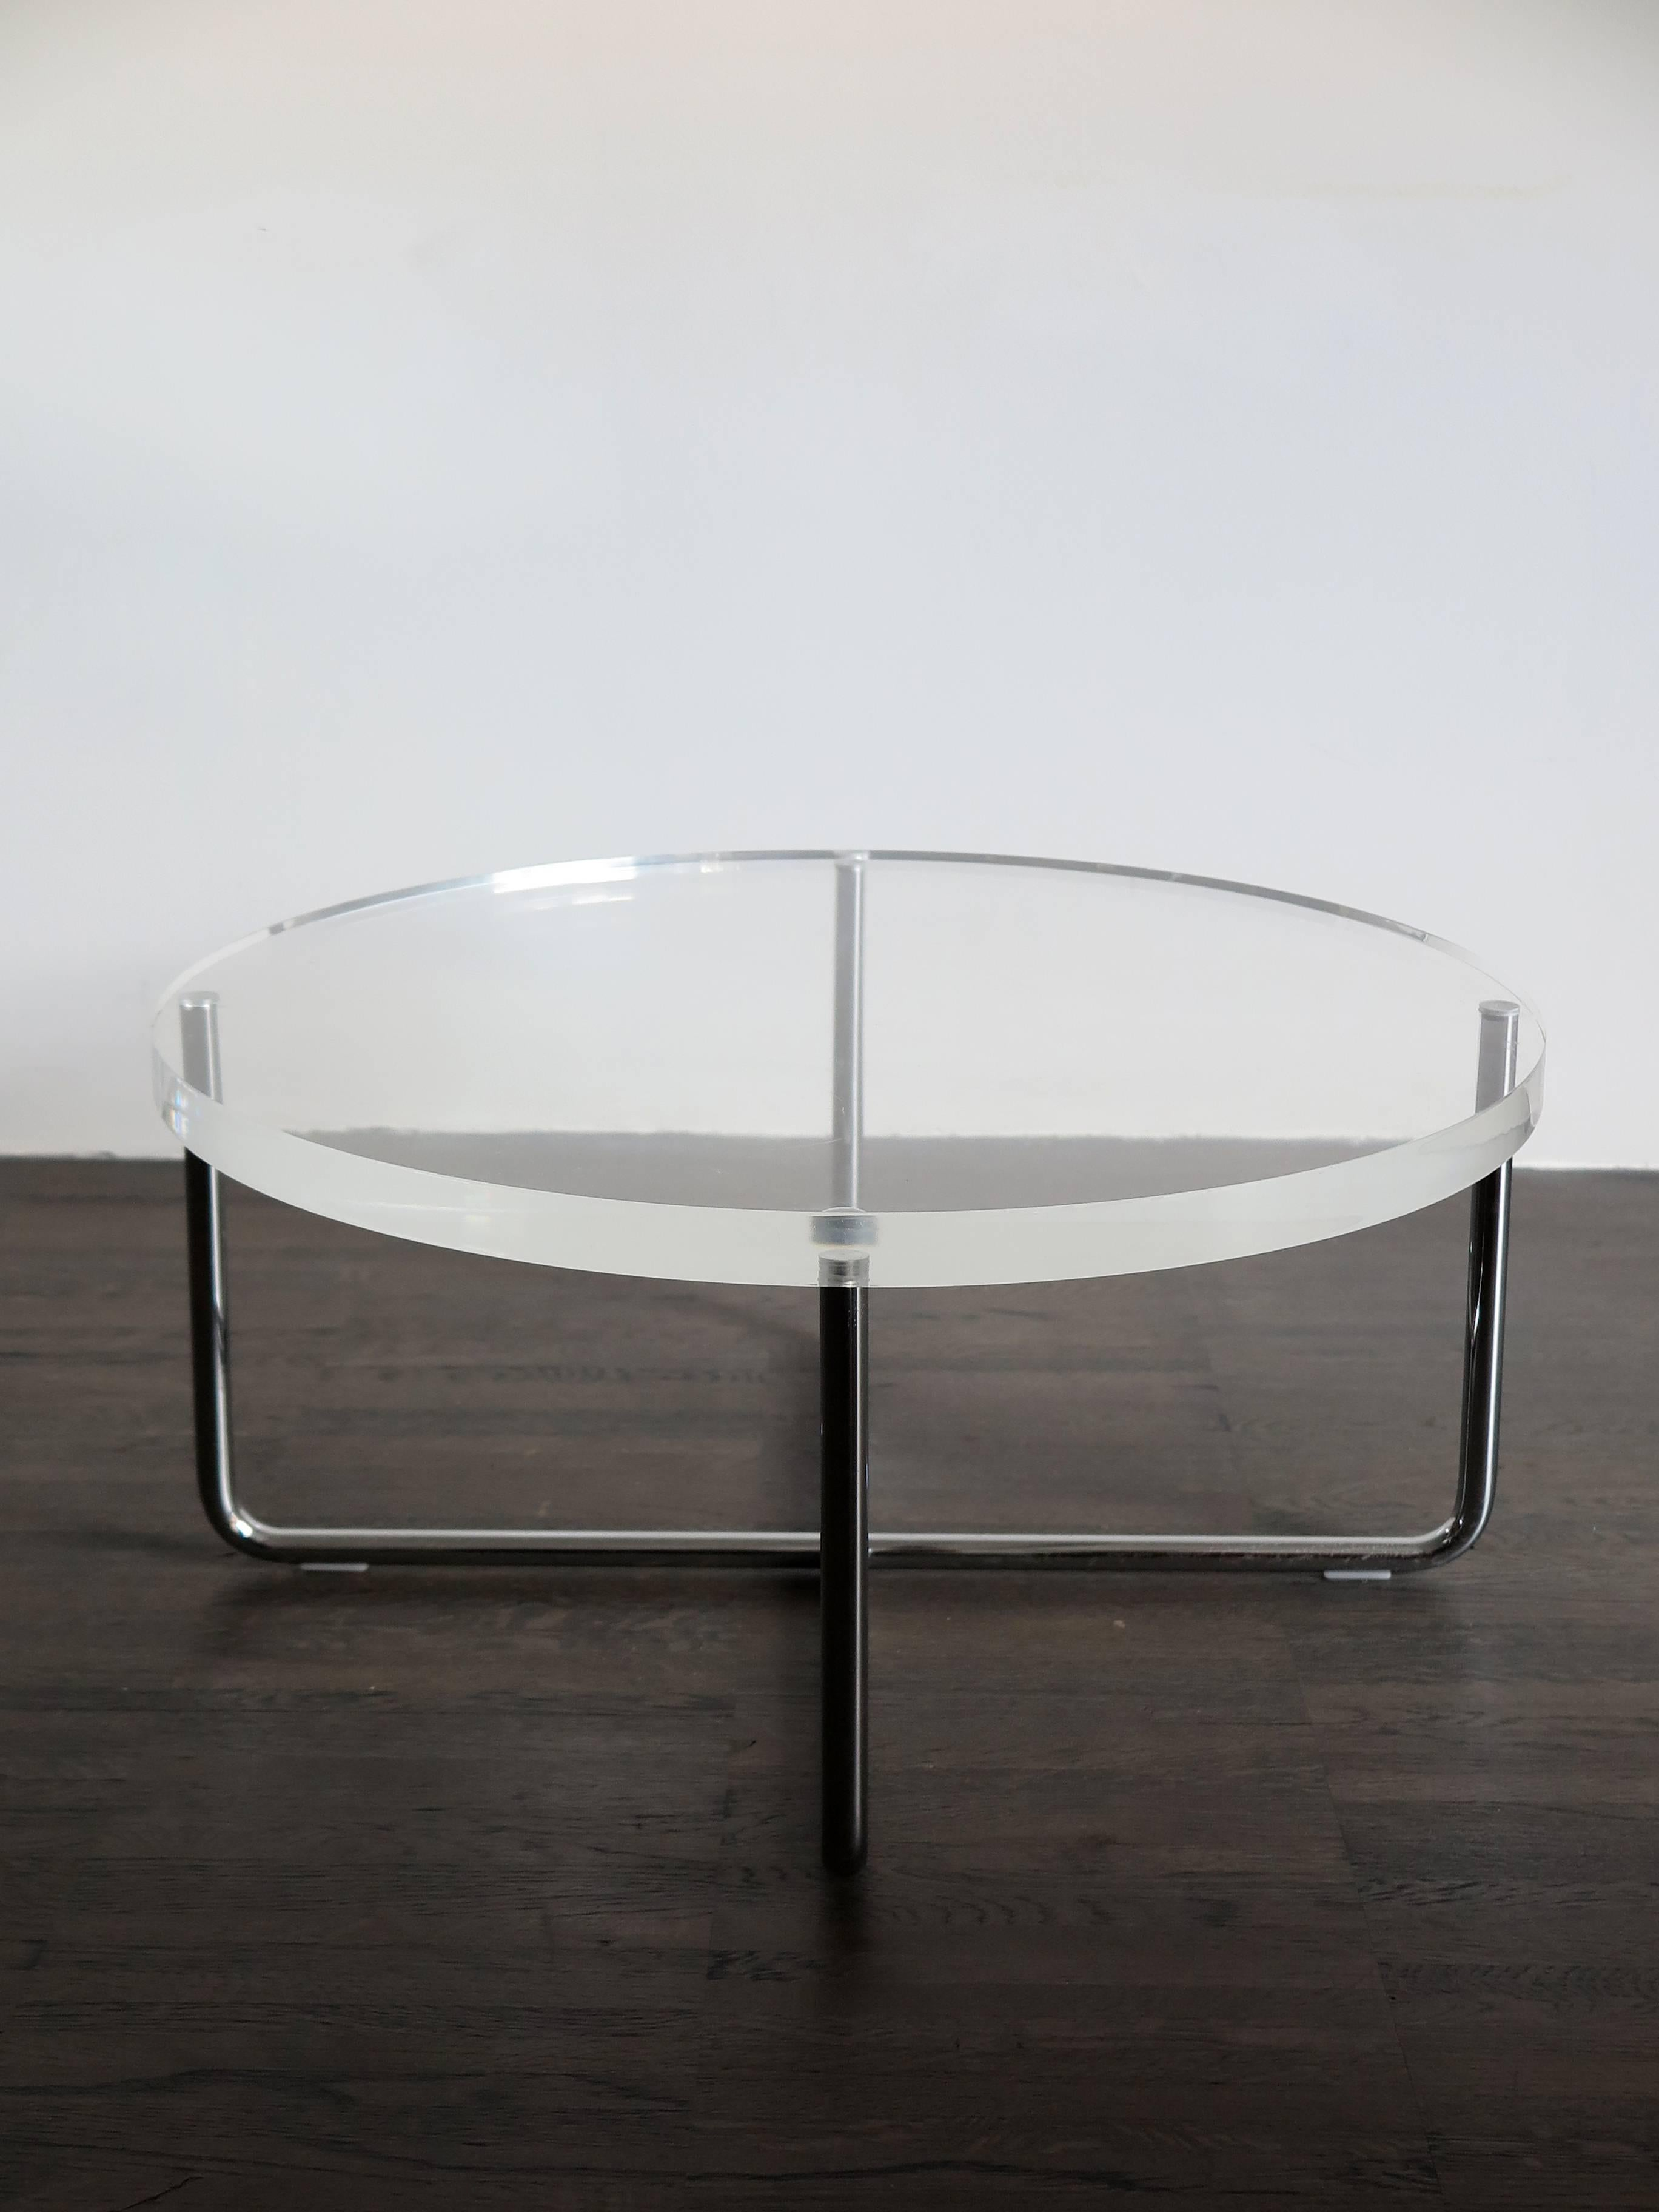 Wonderful 1990s Italian Circular Plexiglass Modern Coffee Table Produced By Minotti  For Sale At 1stdibs